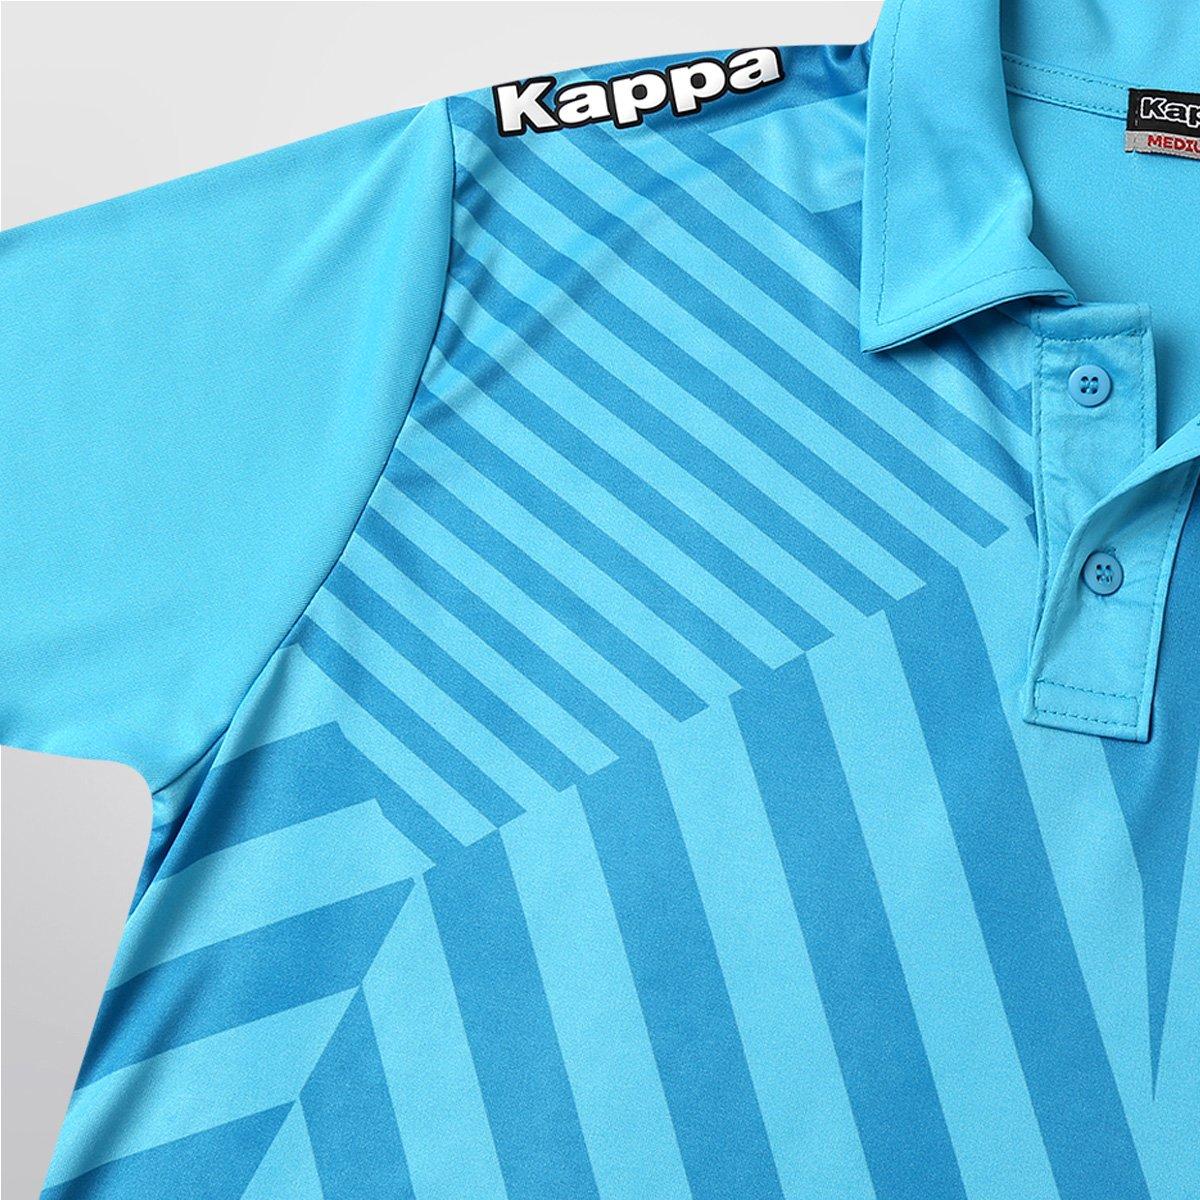 Camisa Polo Santos Kappa Force 2016 Masculina - Compre Agora  eee6d8ce972e1